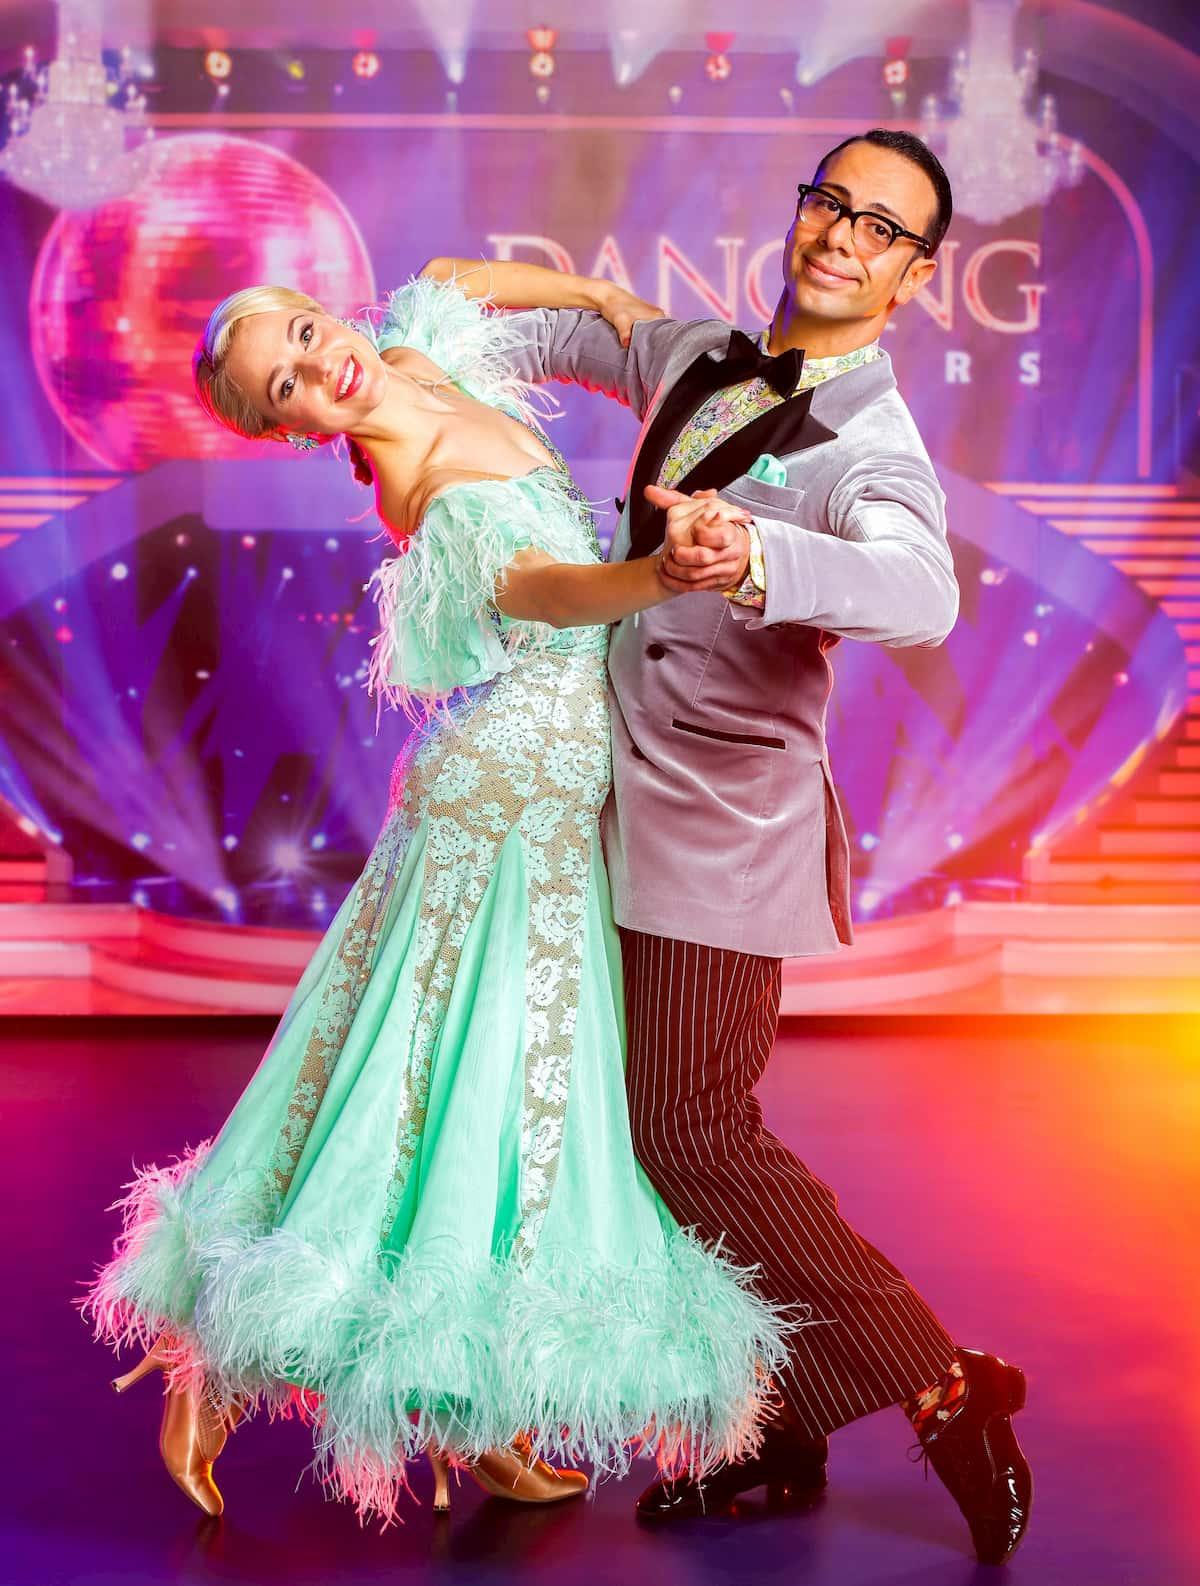 Silvia Schneider - Danilo Campisi bei den Dancing Stars am 6.11.2020